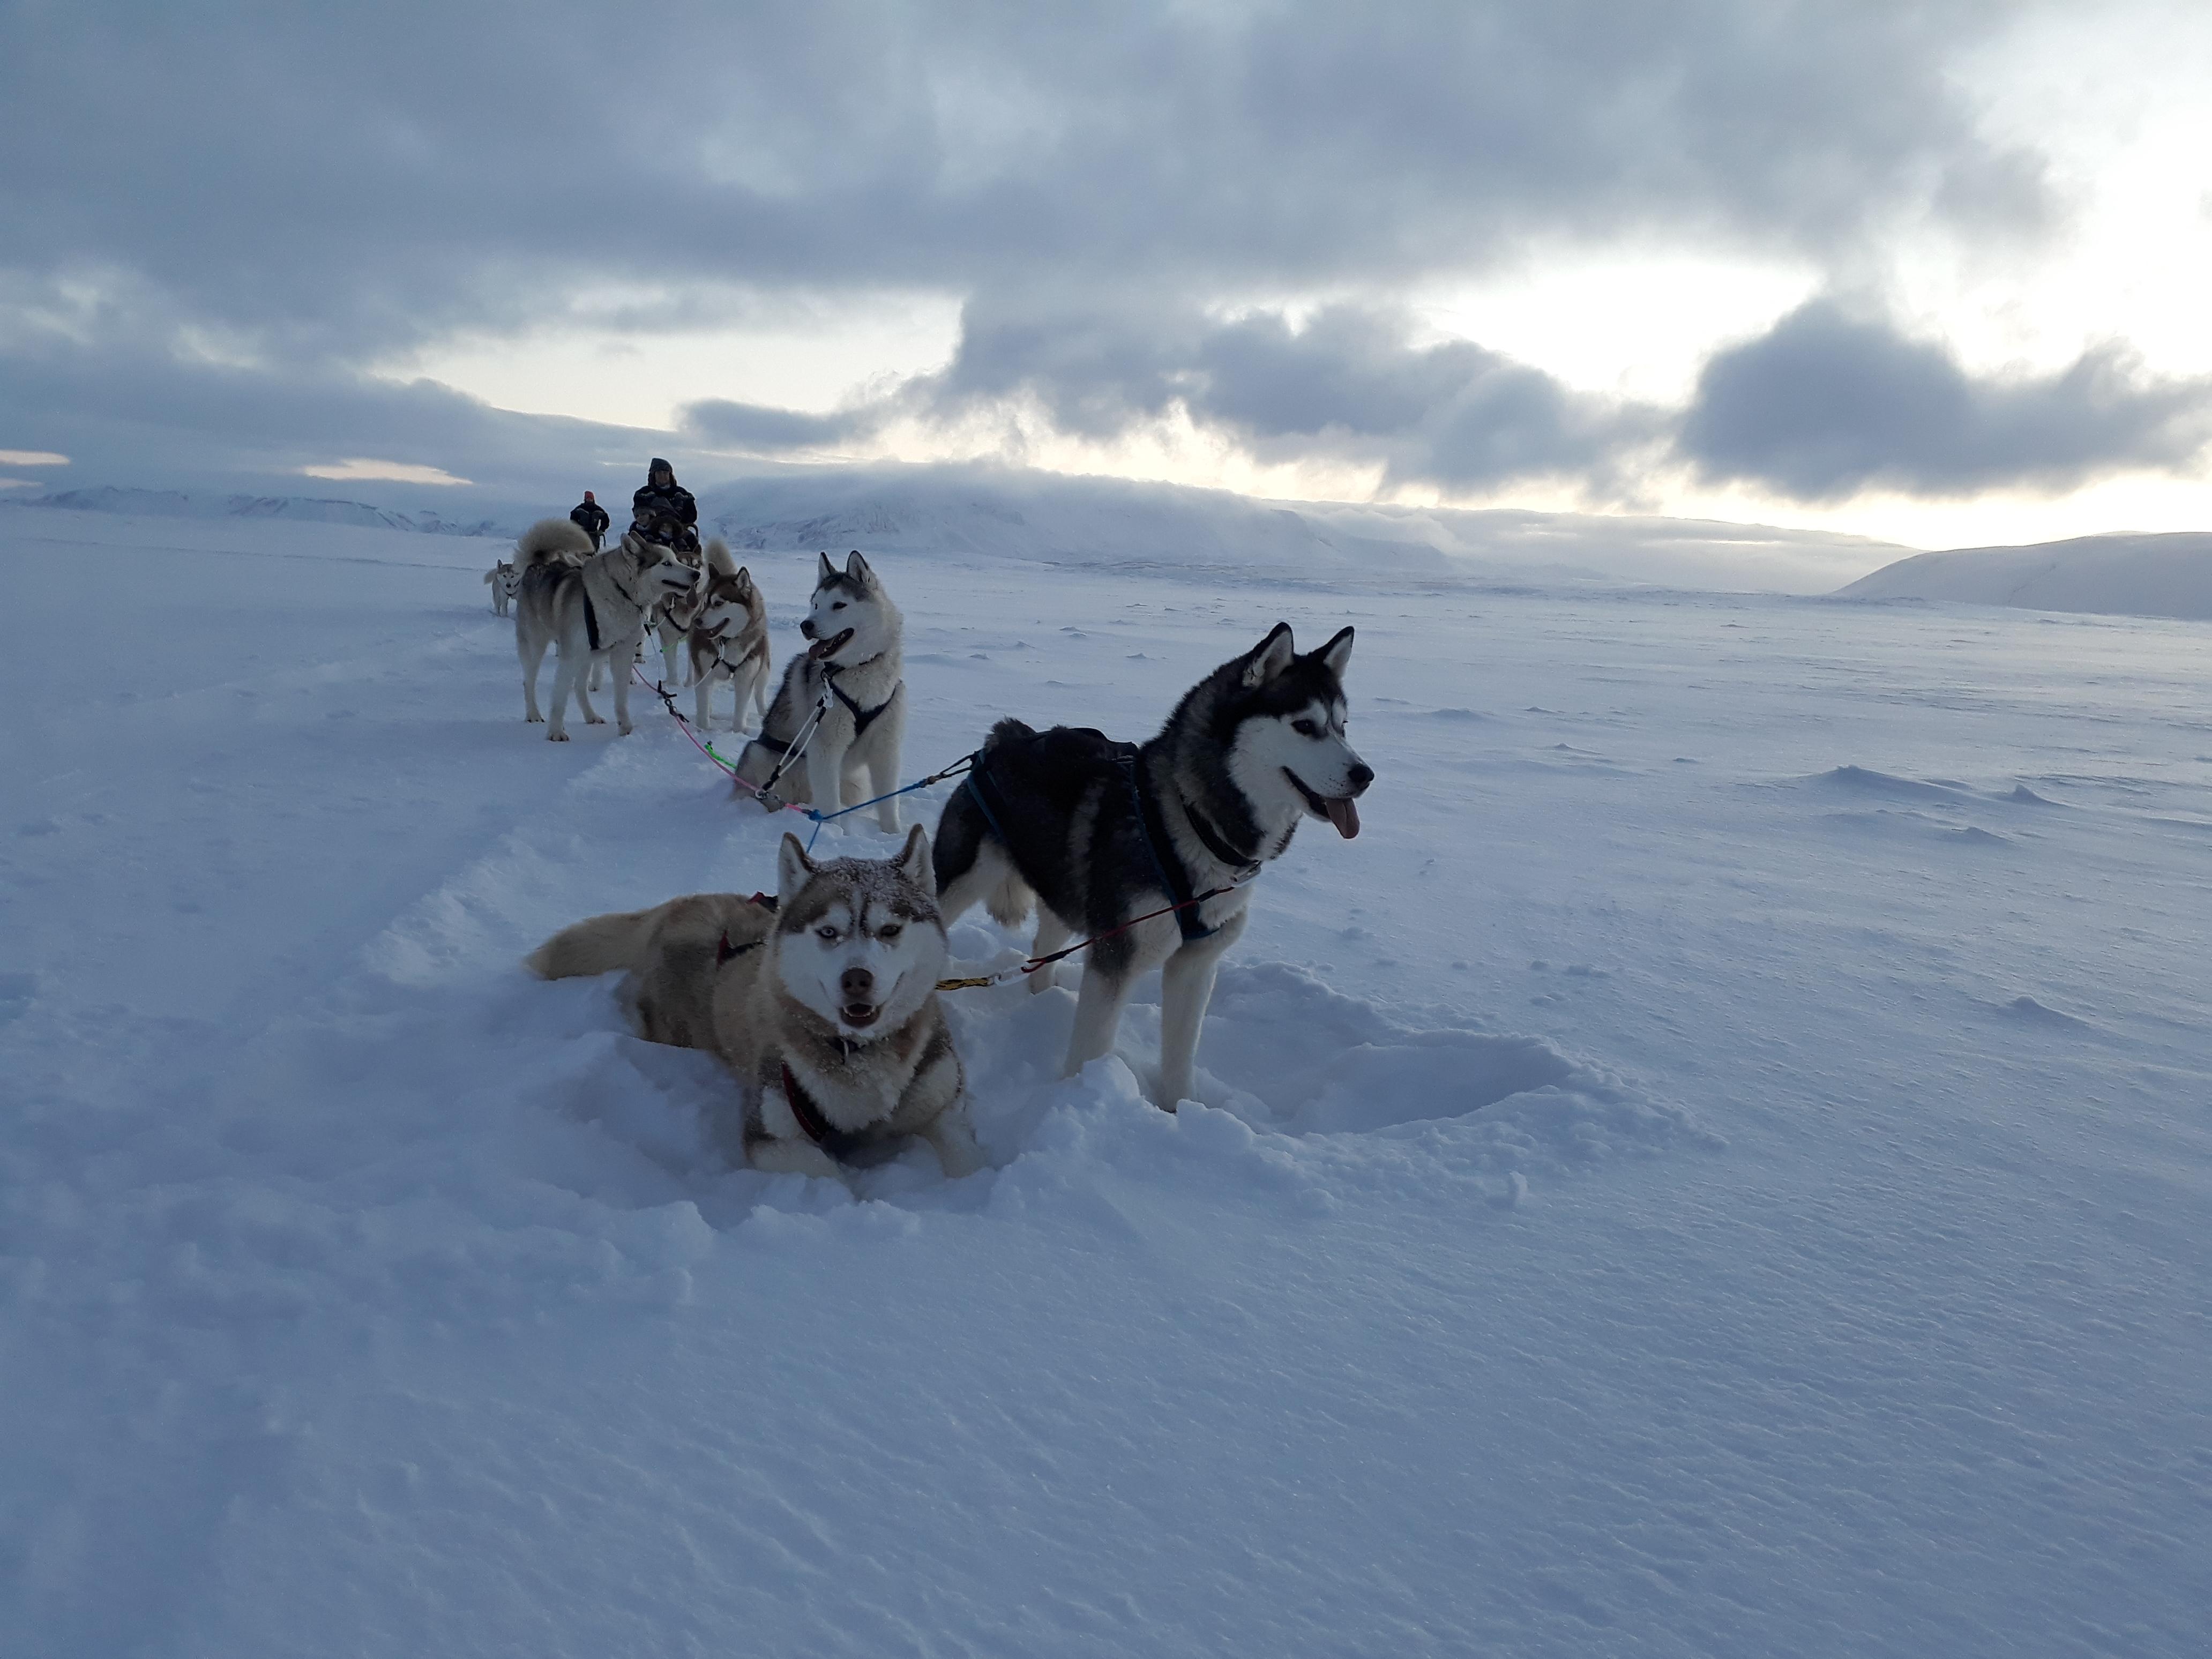 Siberian Huskies resting in the snow.